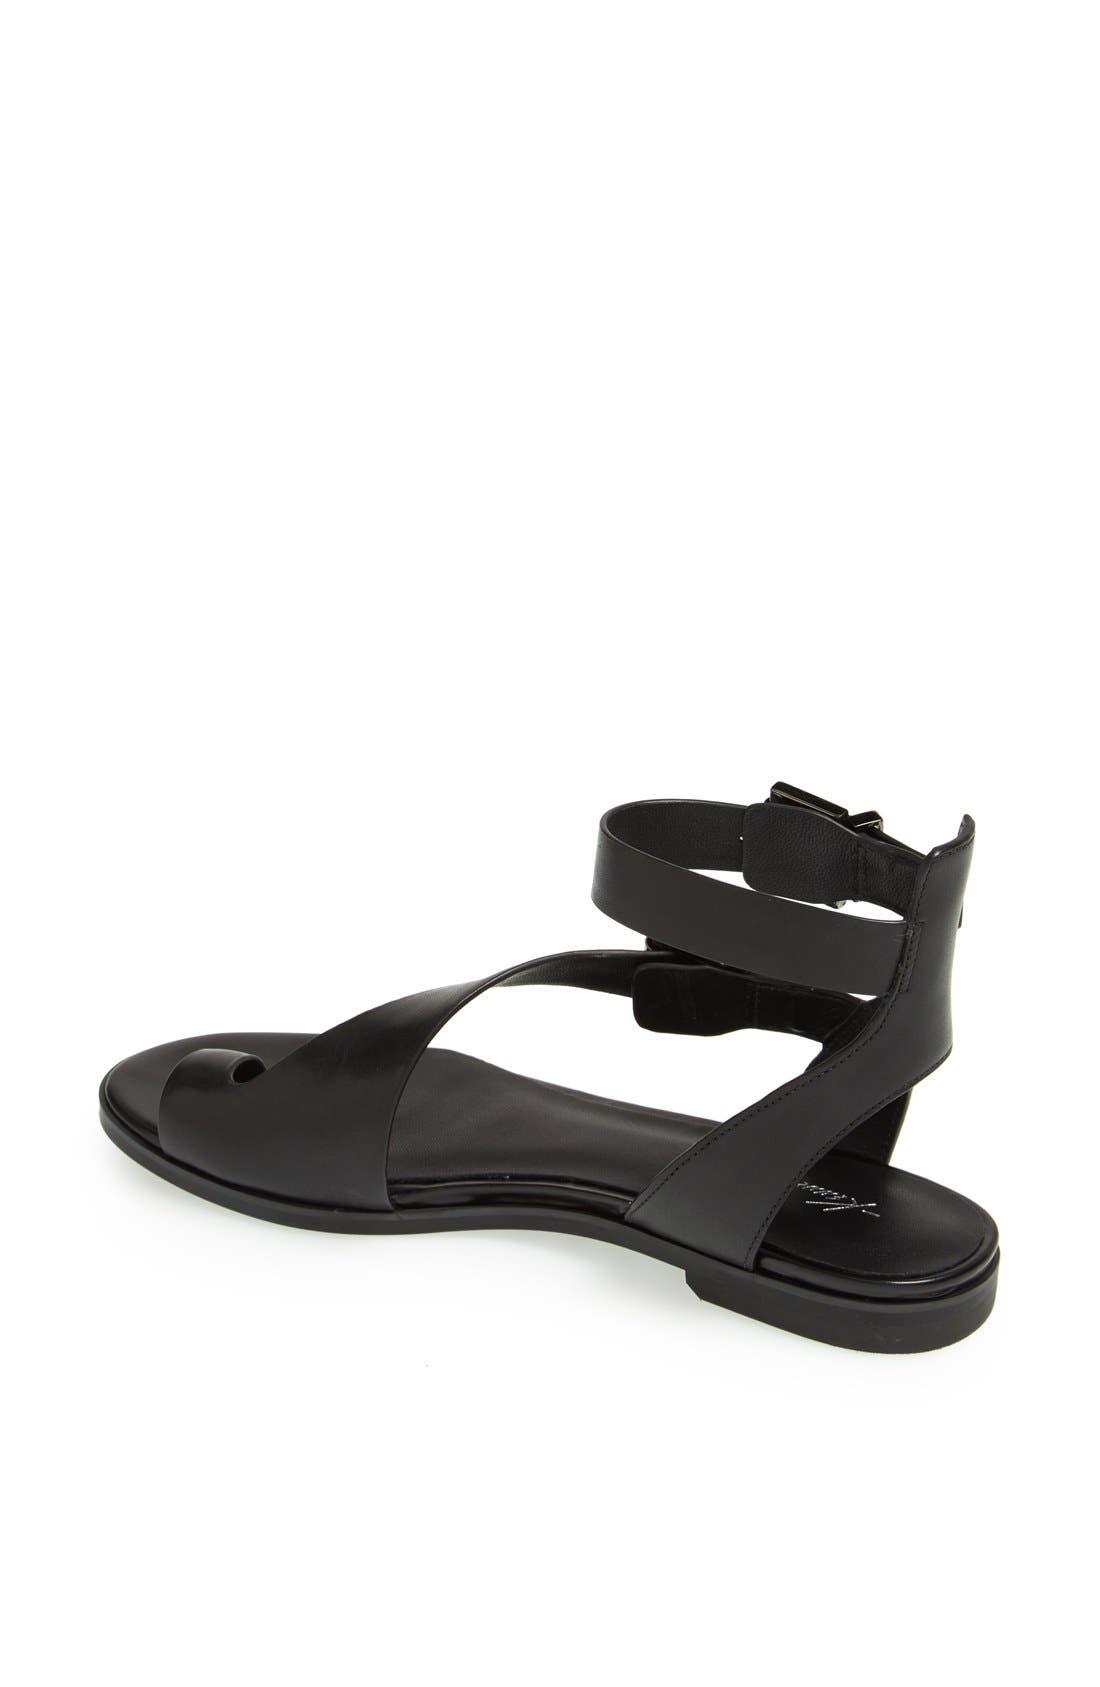 Alternate Image 2  - Kenneth Cole 'Ditmas' Leather Sandal